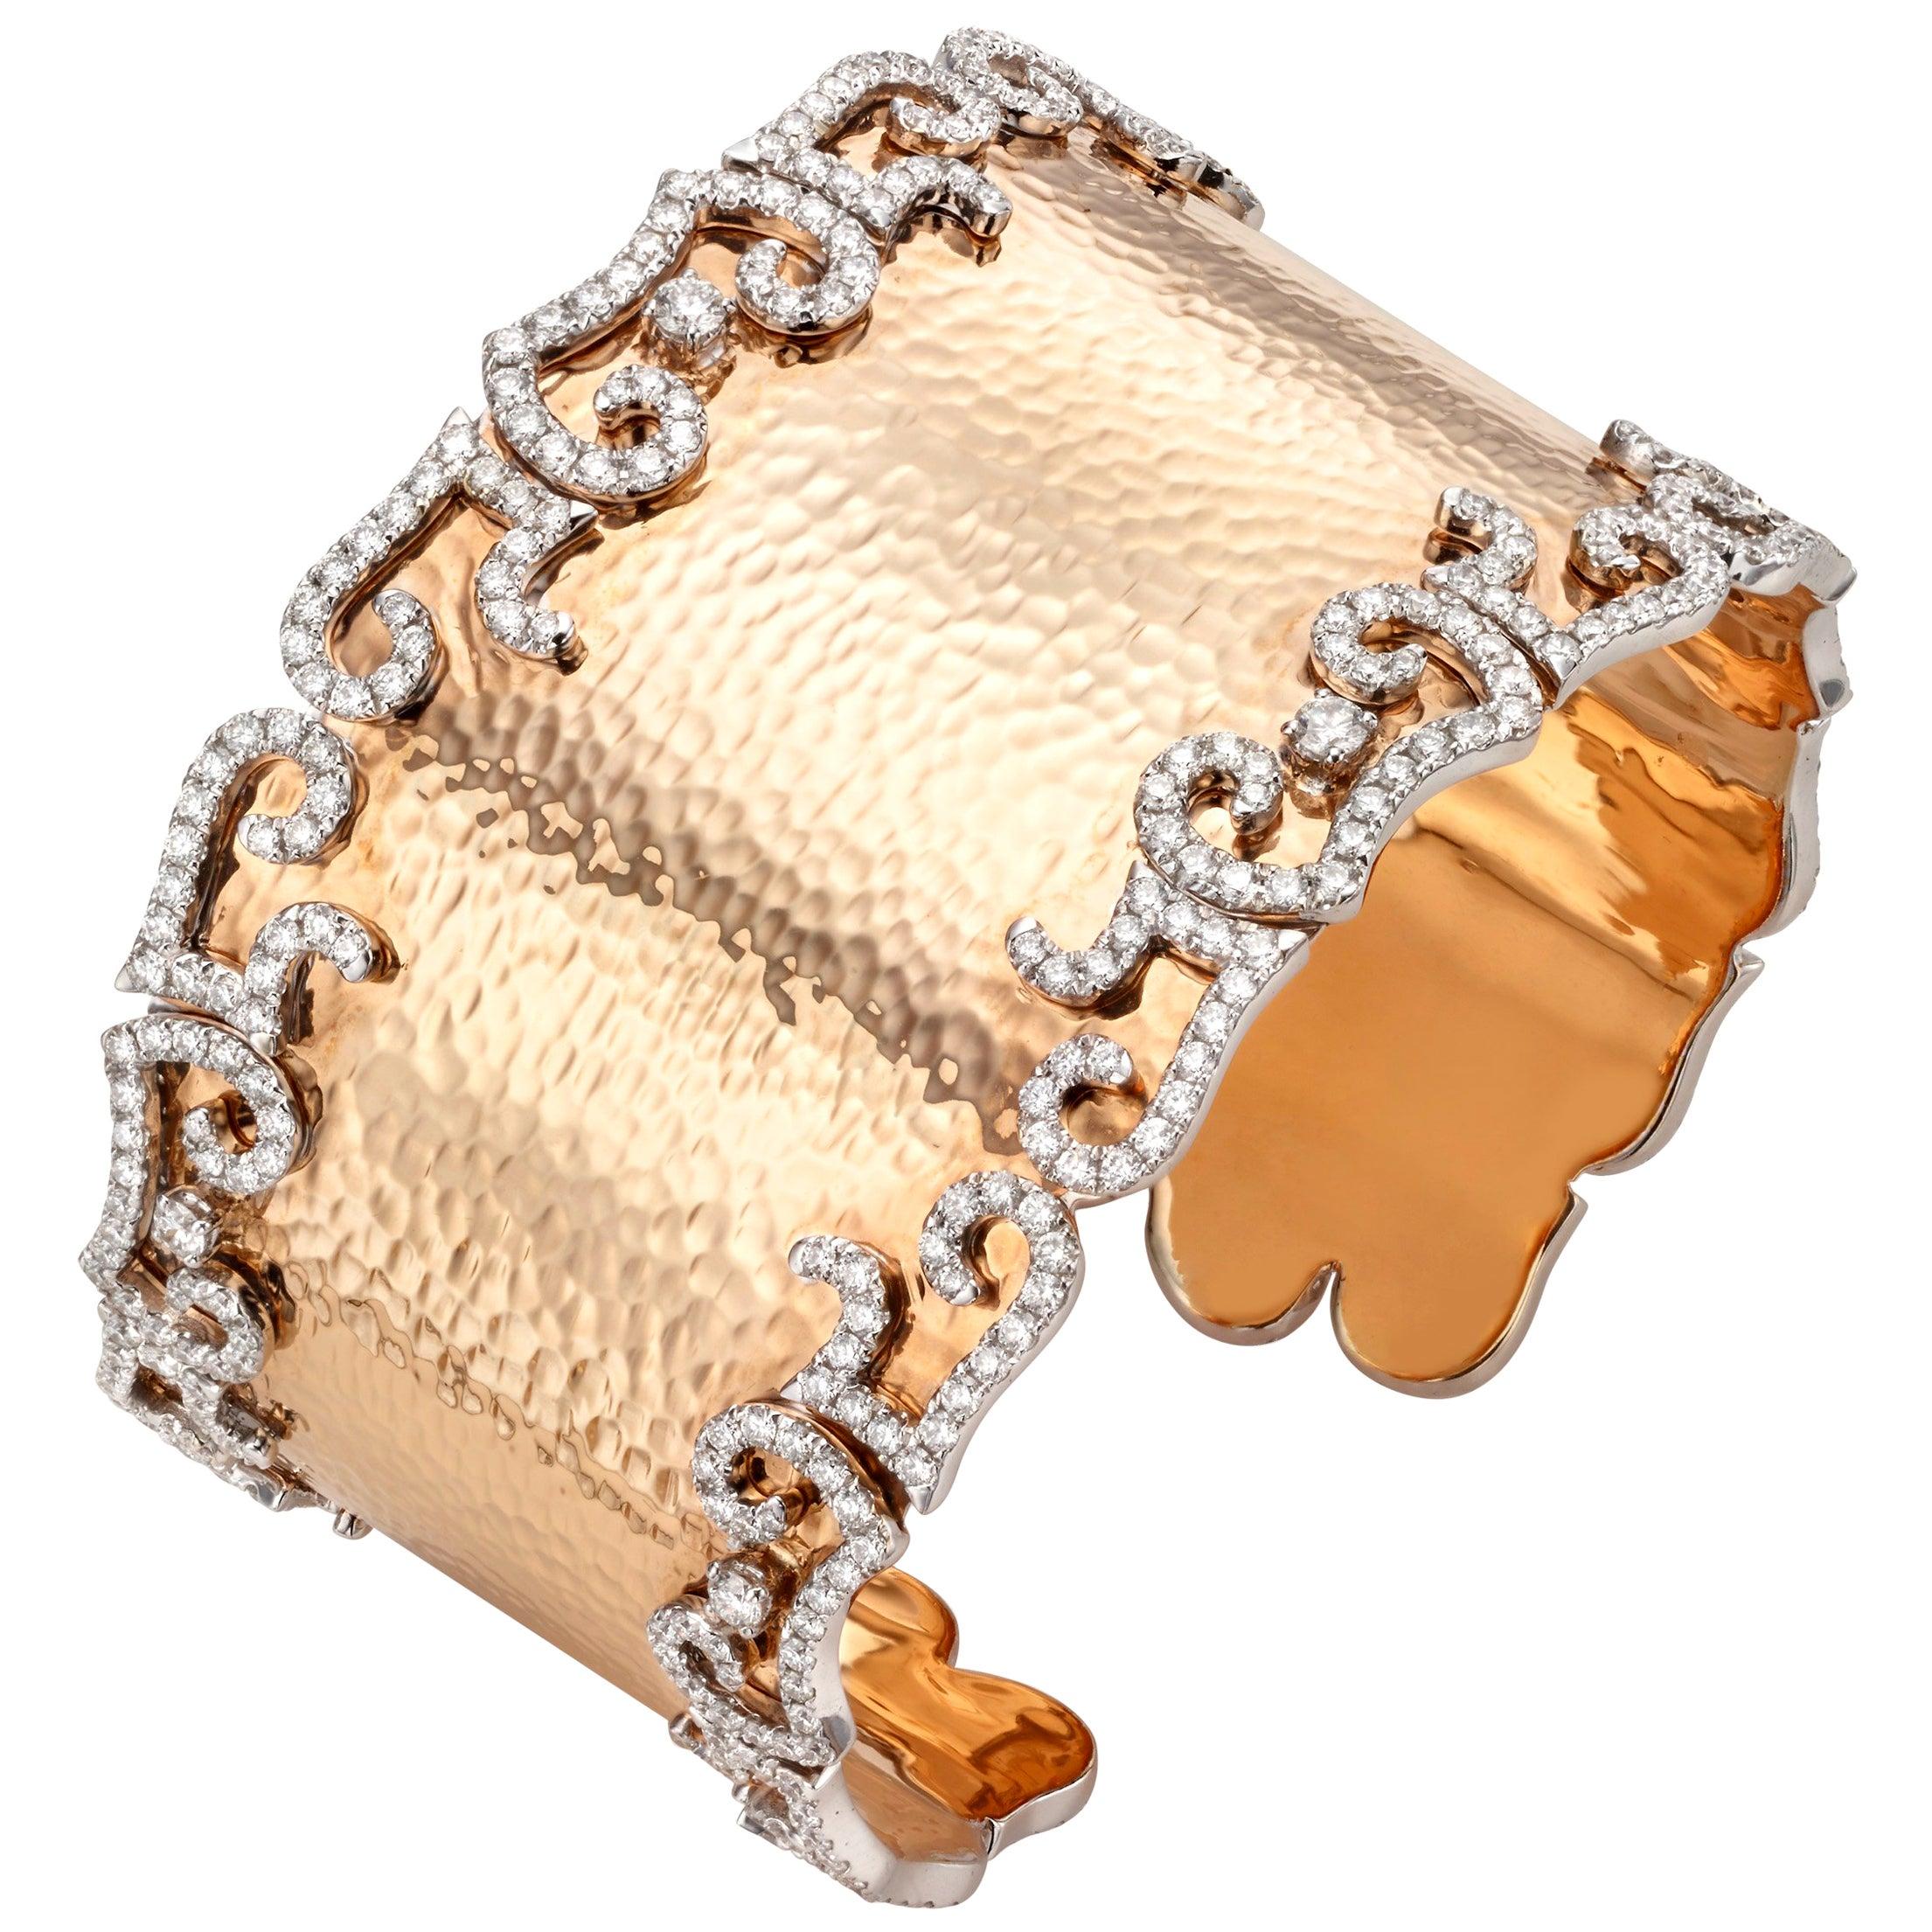 7.65 Carat Diamond 18 Karat Hammered Rose Gold Cuff Bangle